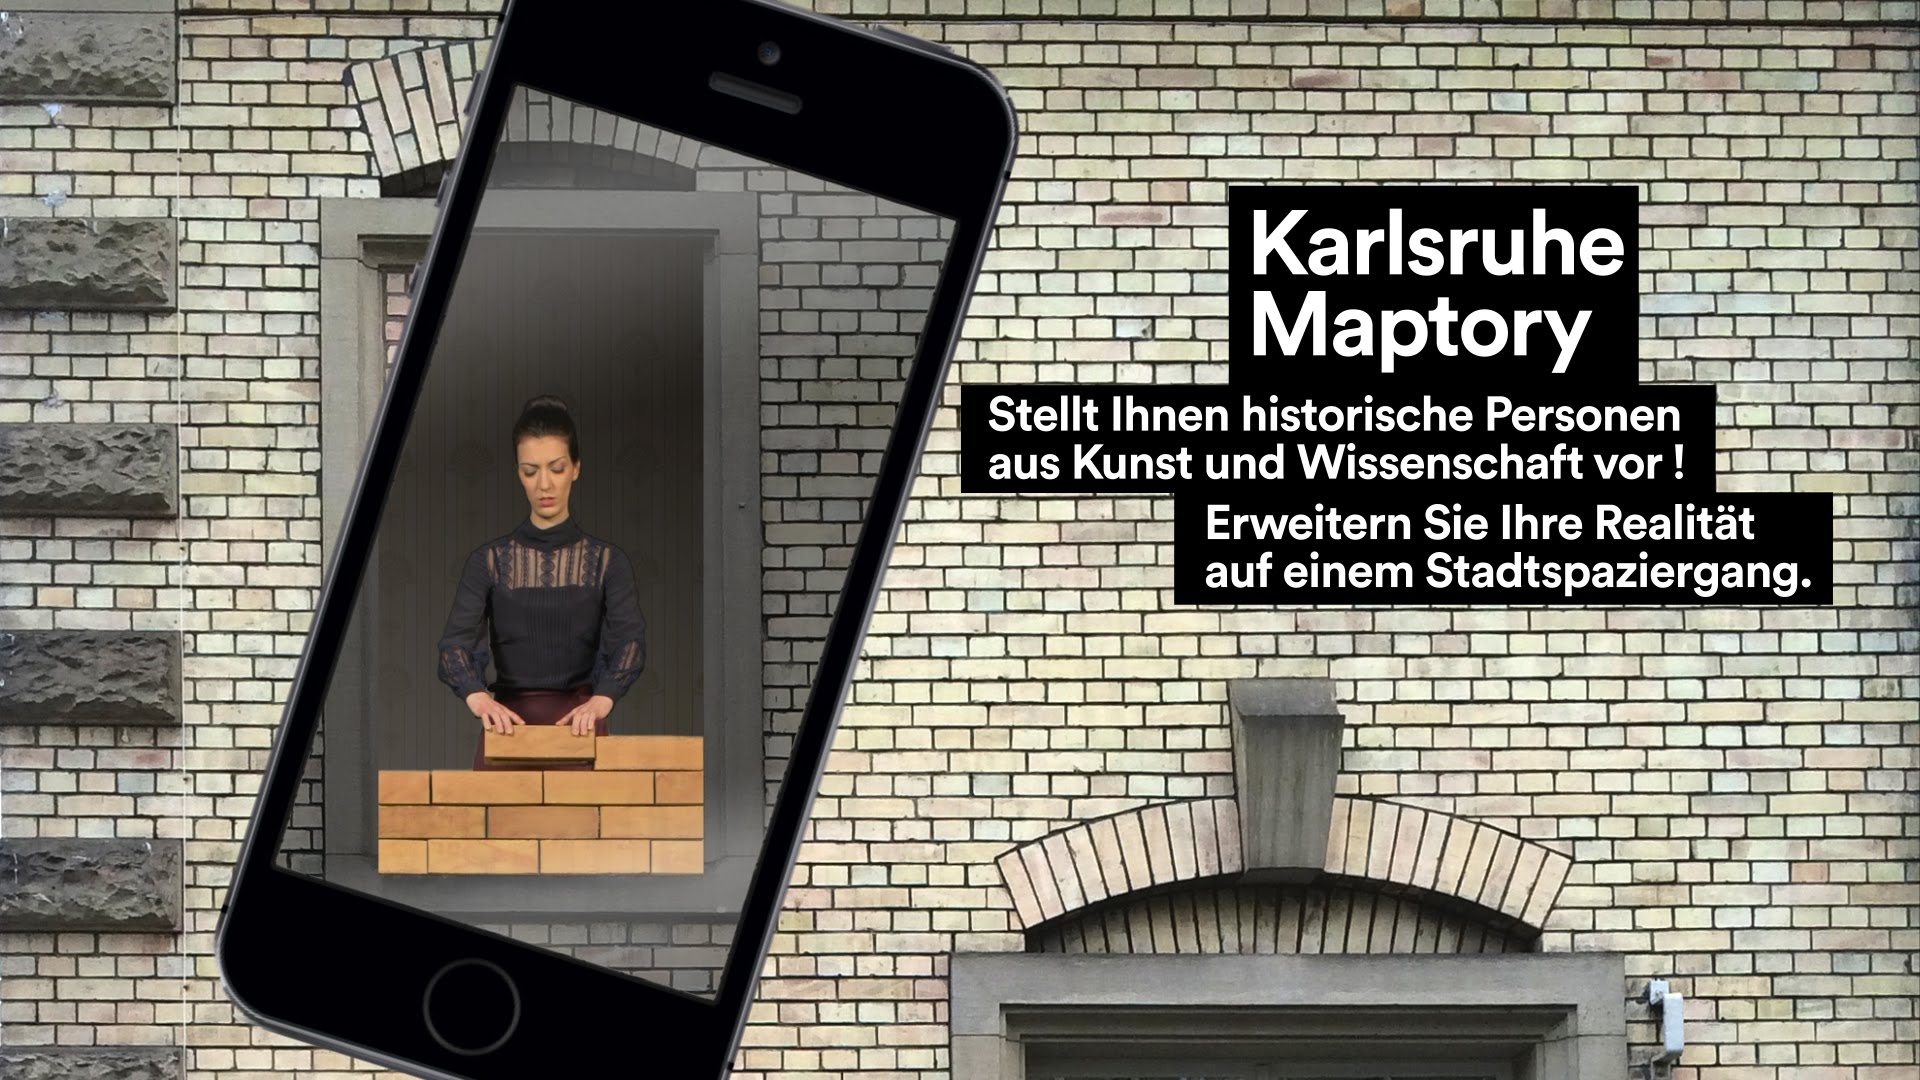 zkm globale karlsruhe maptory apple app store museumsfernsehen. Black Bedroom Furniture Sets. Home Design Ideas